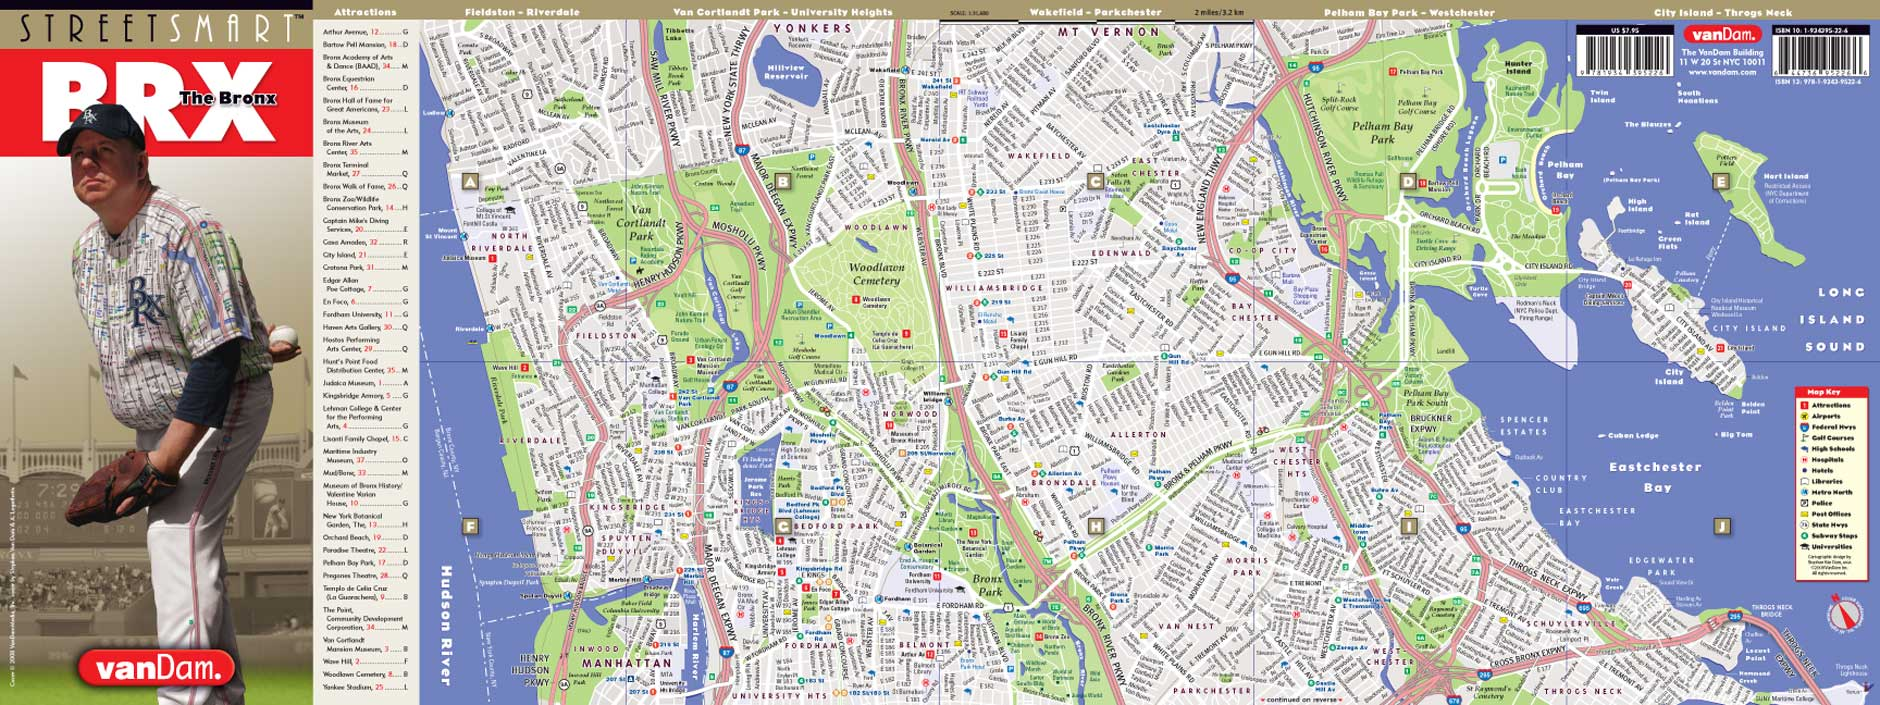 Bronx Map by VanDam | Bronx StreetSmart Map | City Street Maps of